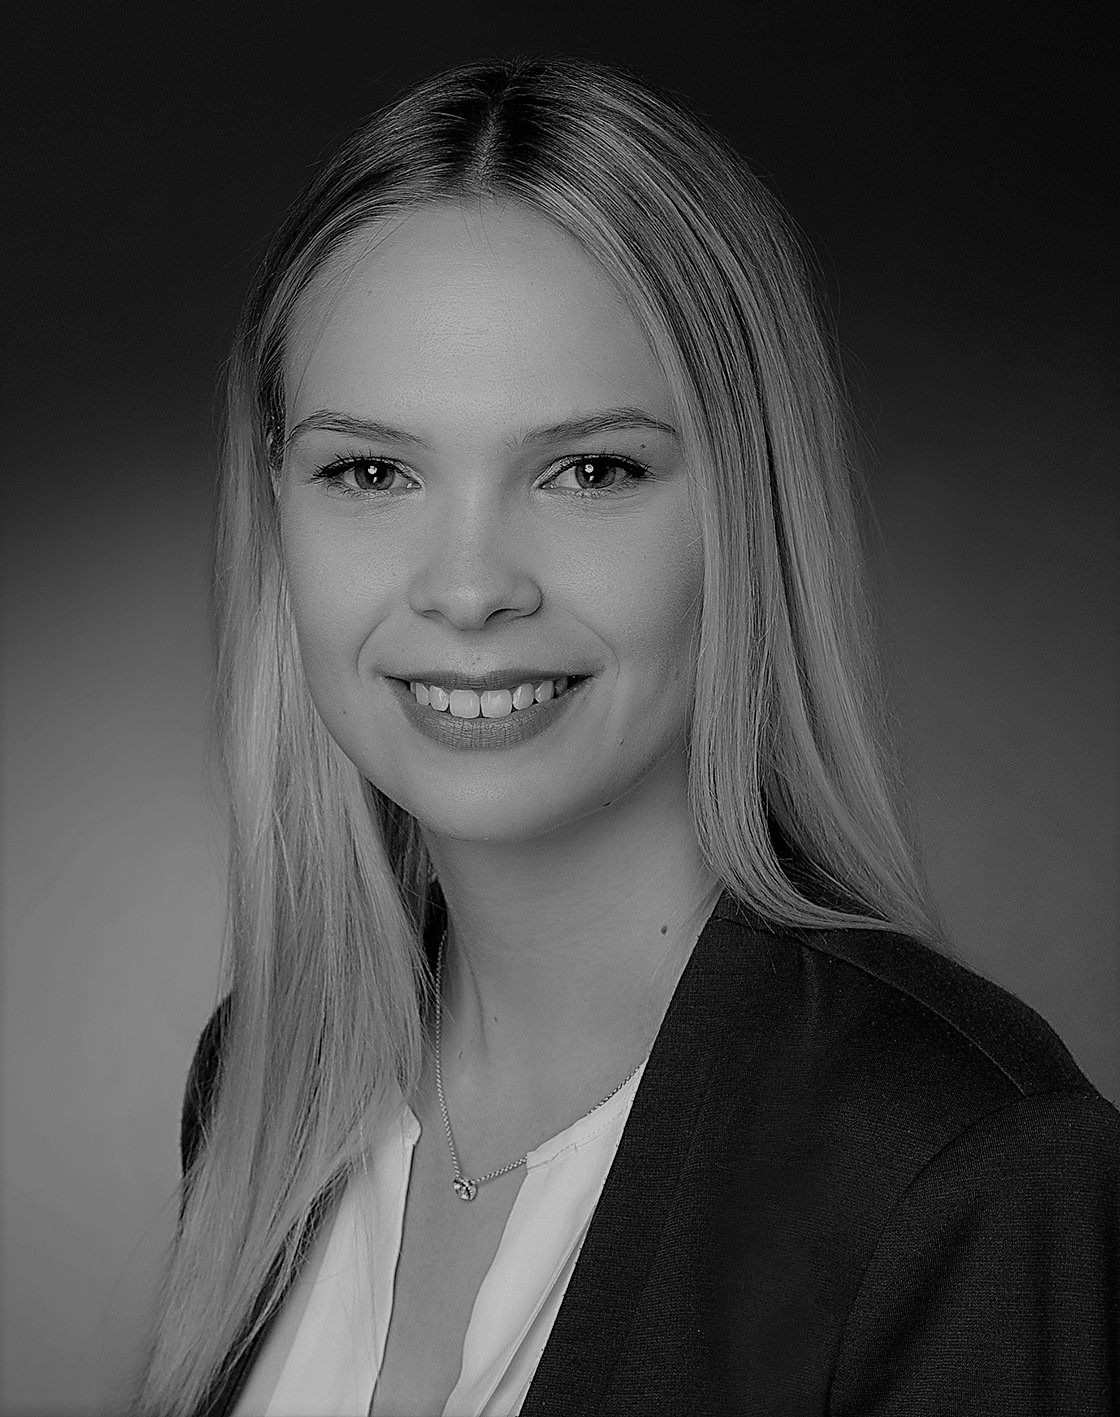 Christina Holzapfel